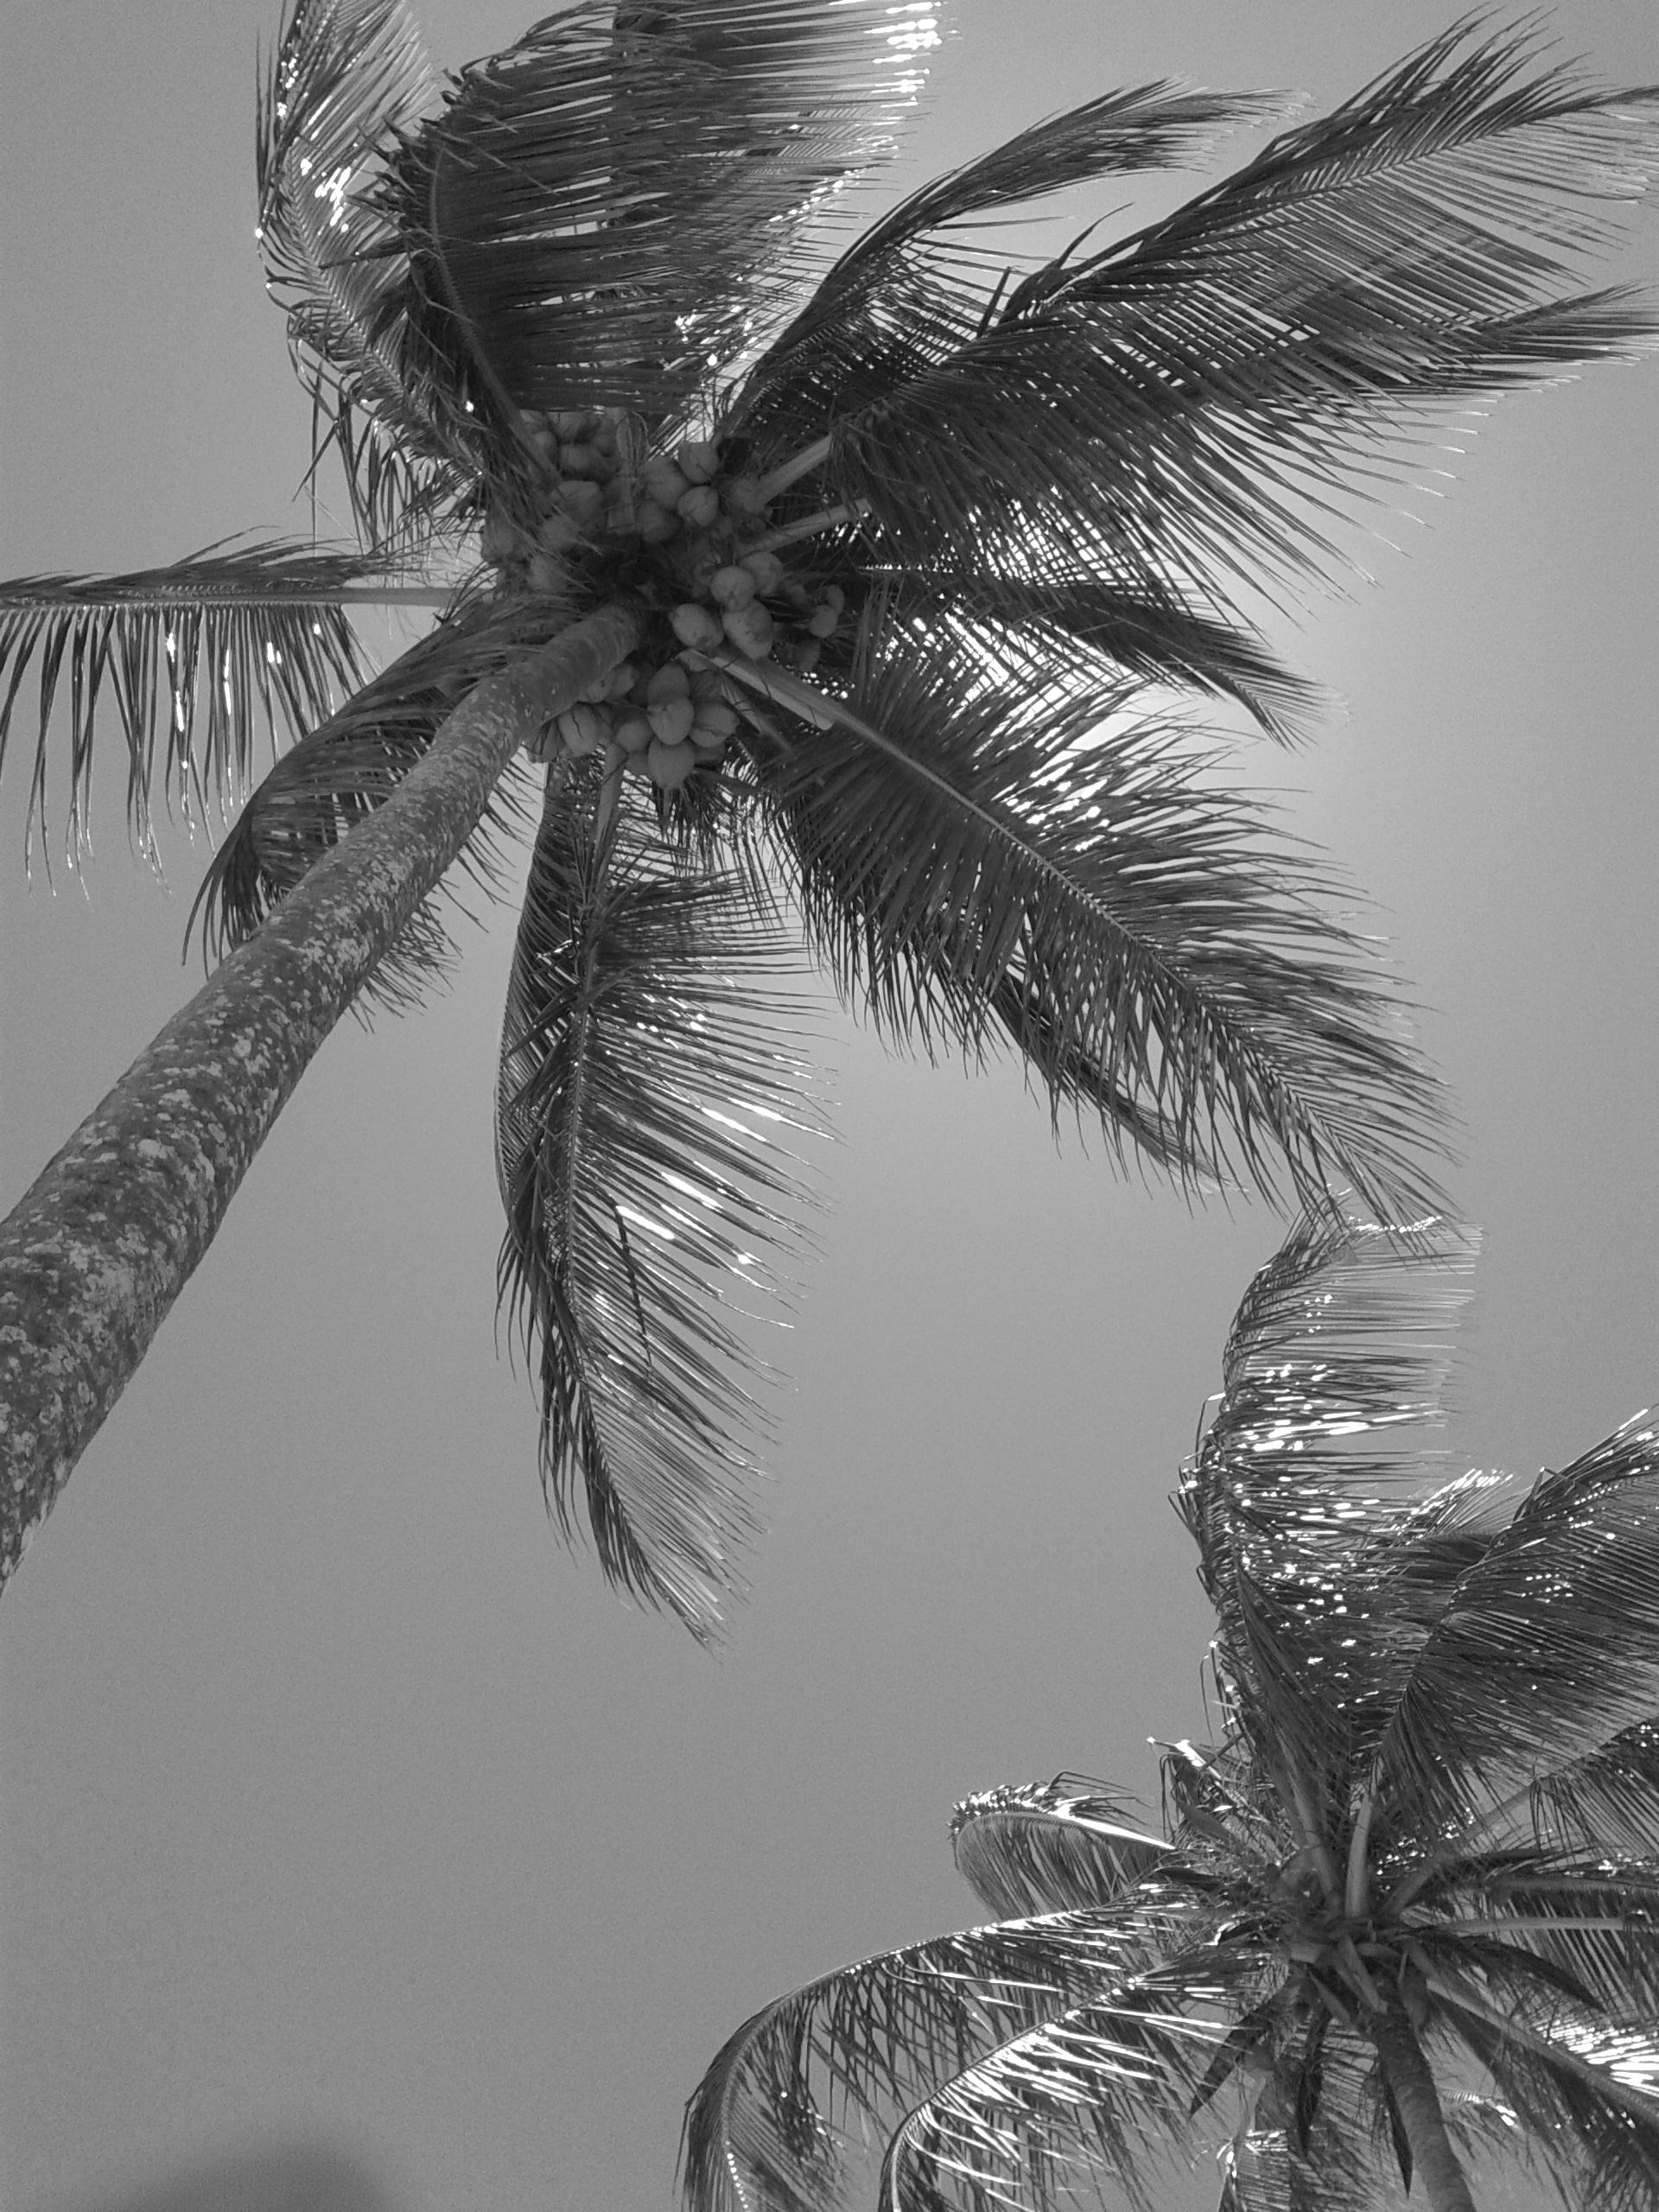 Gambar Pantai Alam Cabang Sayap Hitam Dan Putih Daun Embun